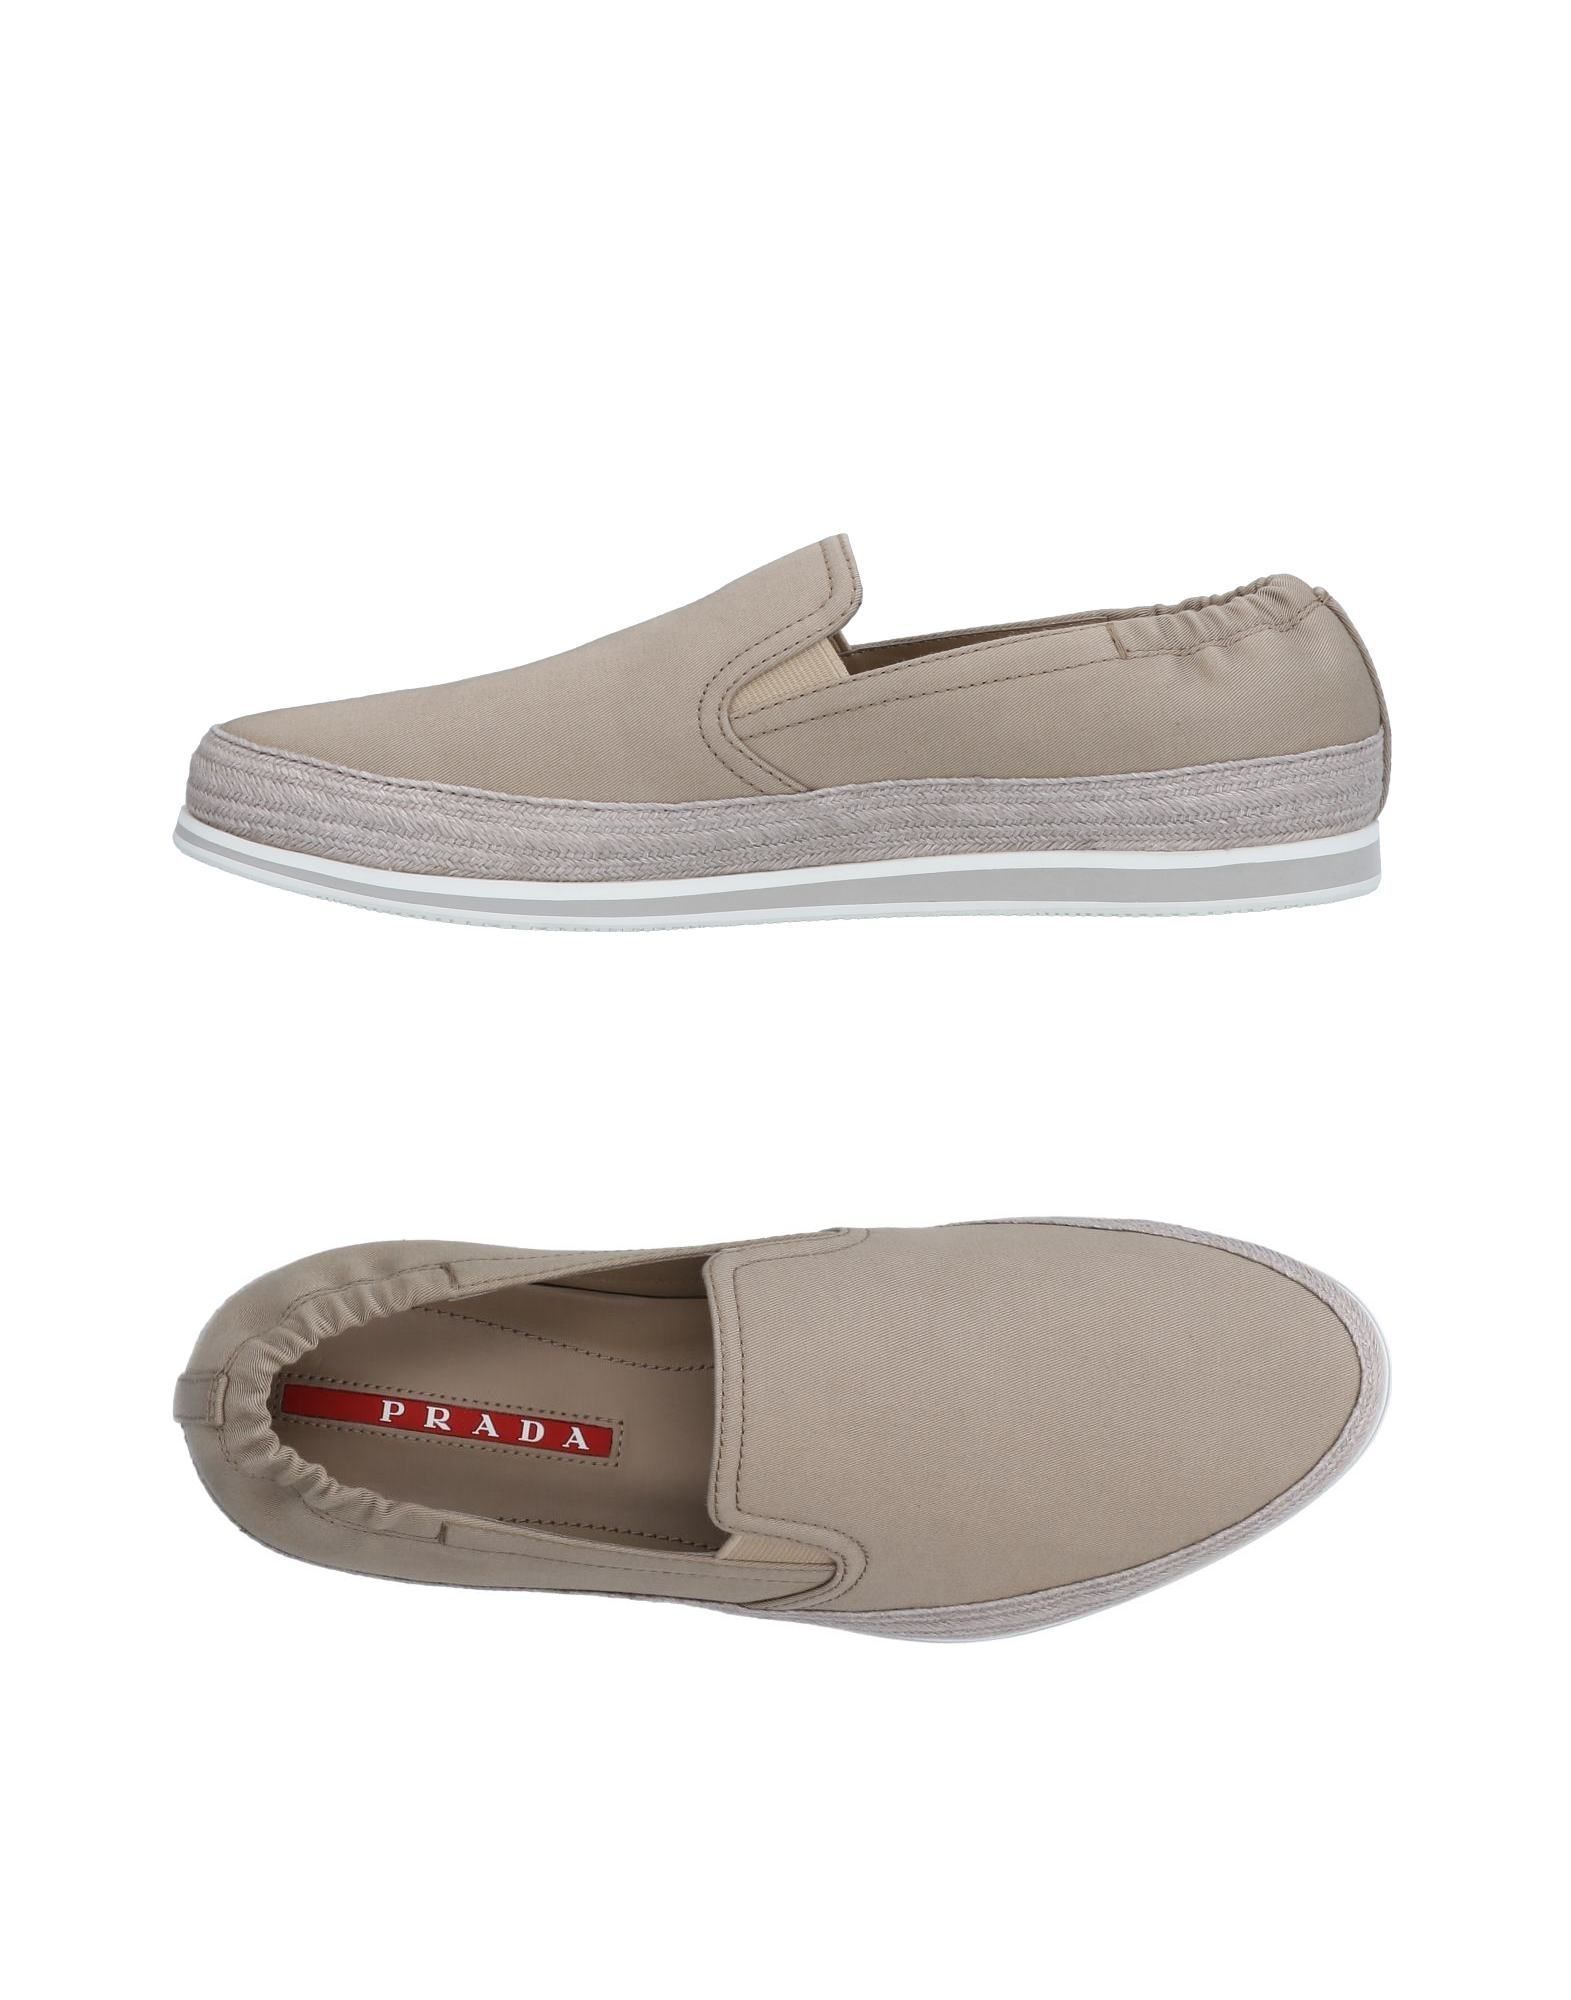 Prada Sport Sneakers Herren beliebte  11392054VU Gute Qualität beliebte Herren Schuhe b8639d